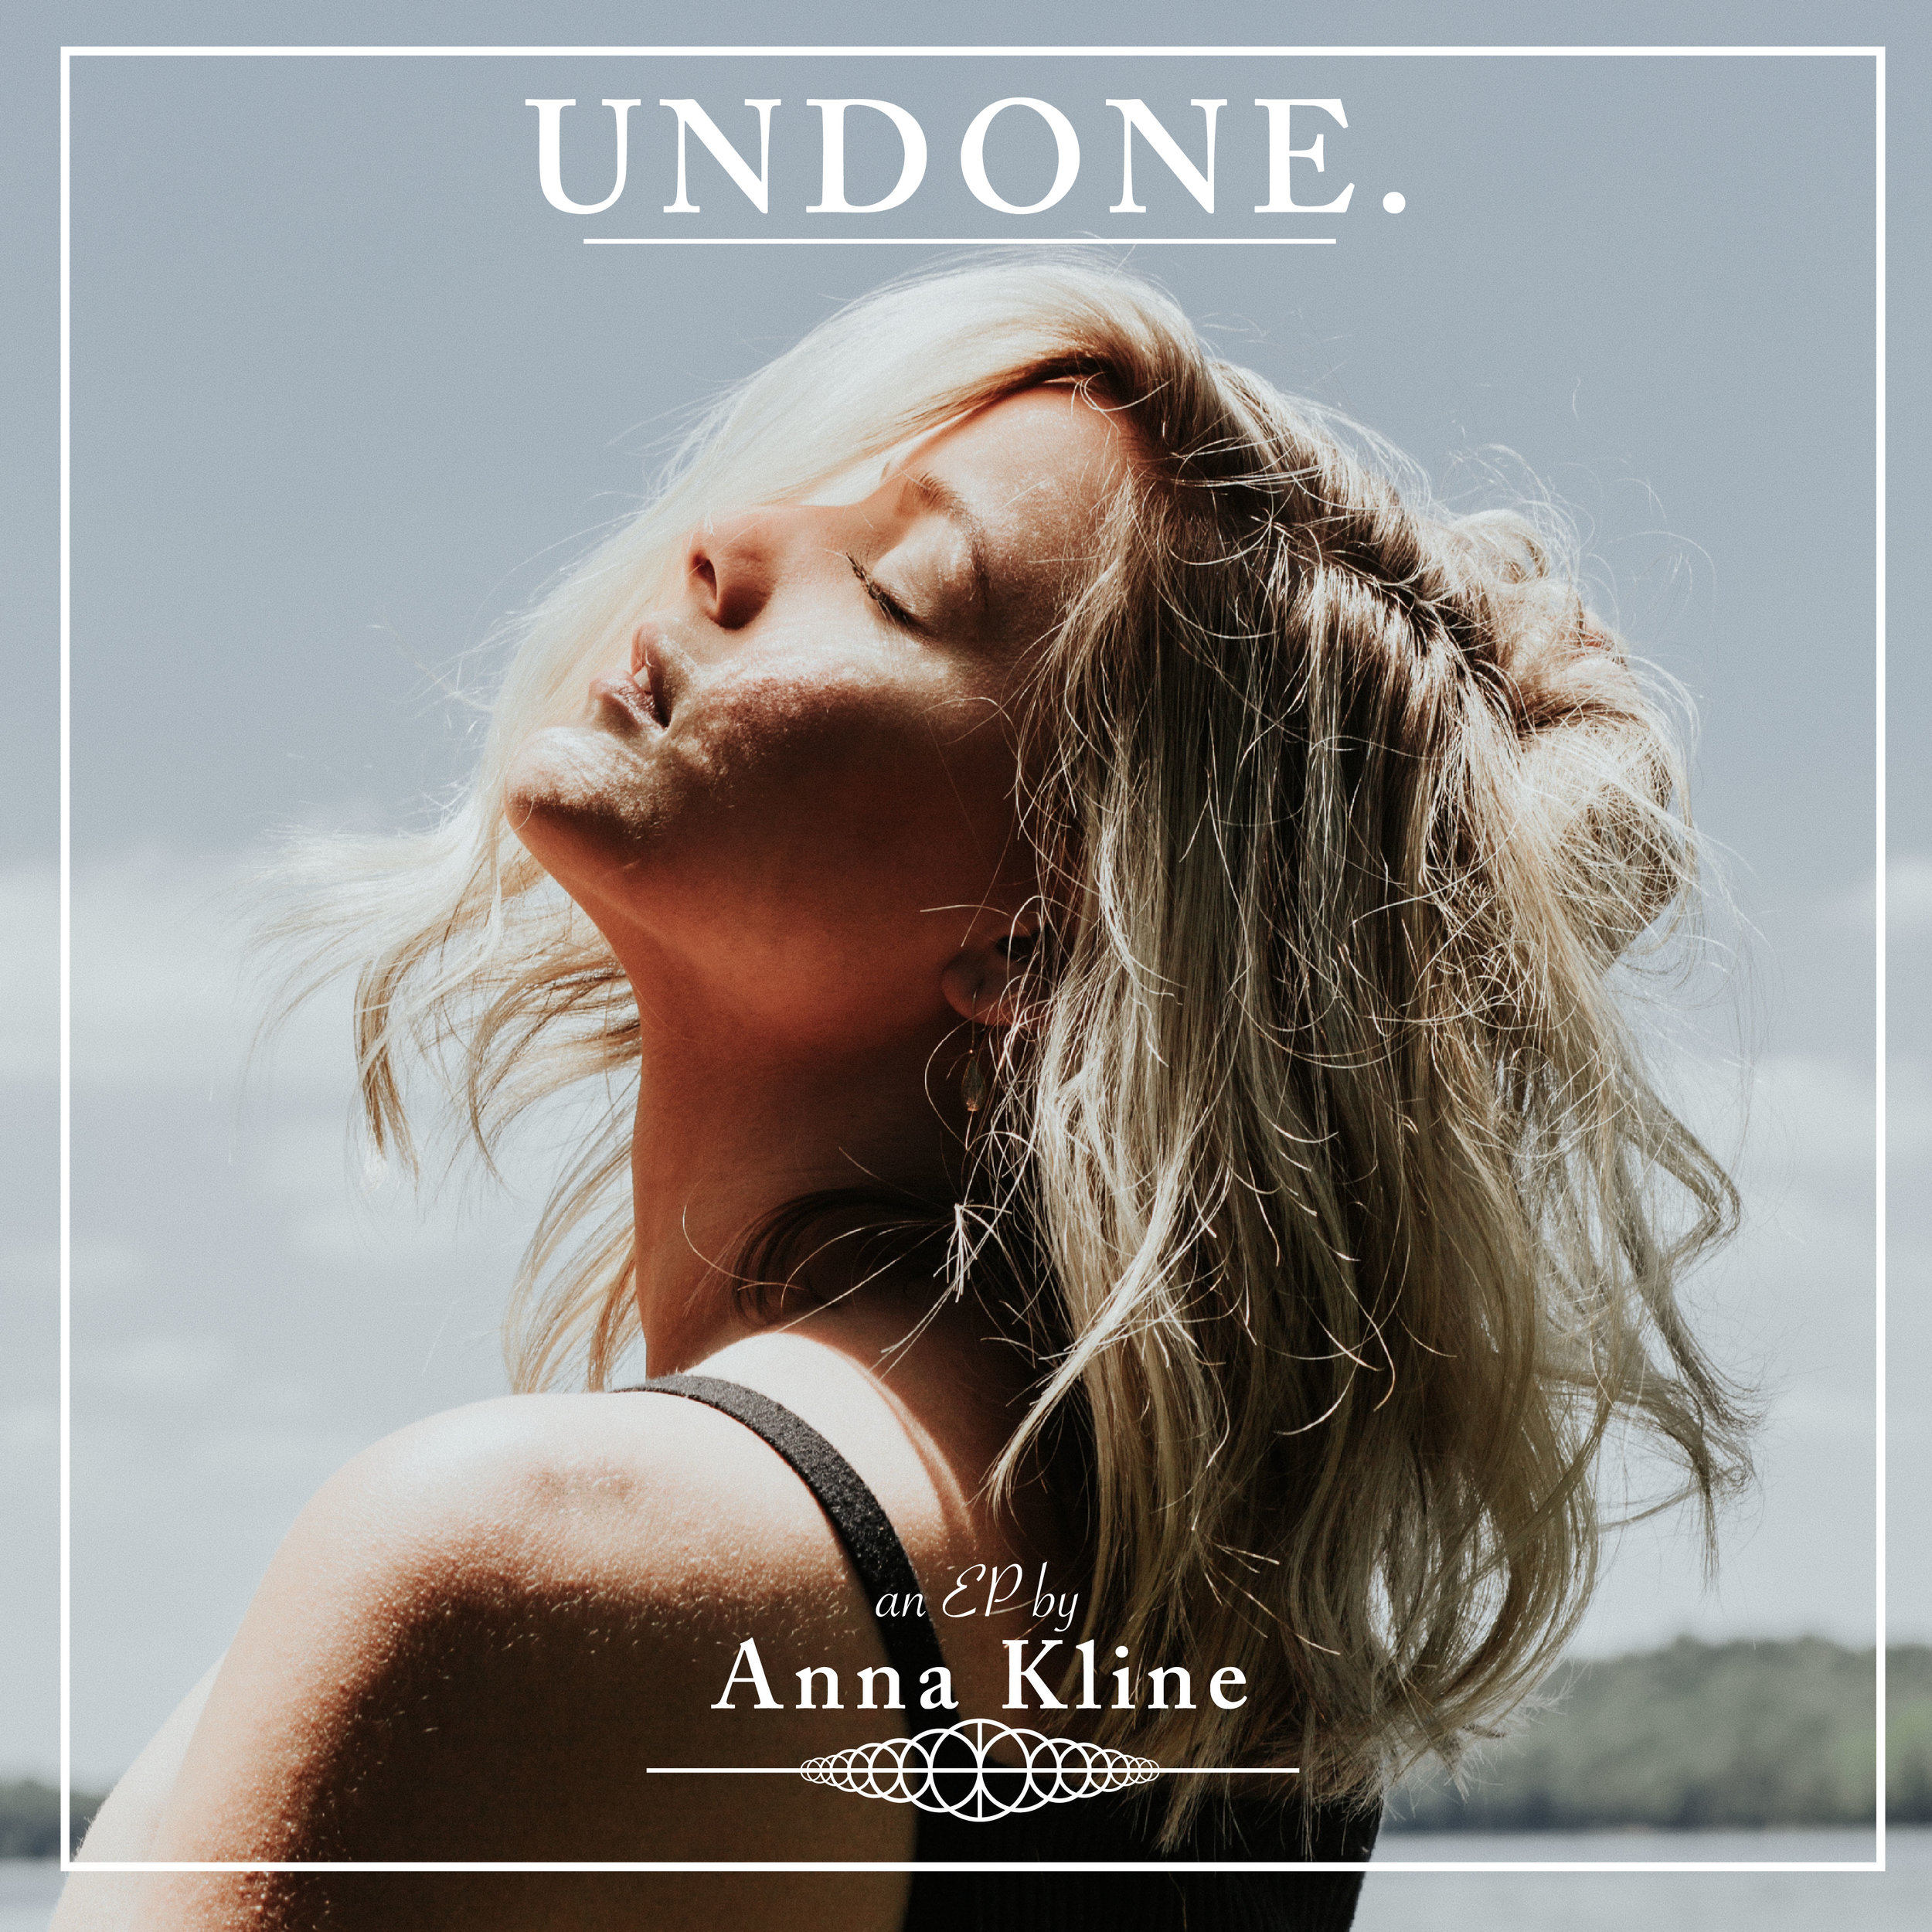 Undone. Album Cover